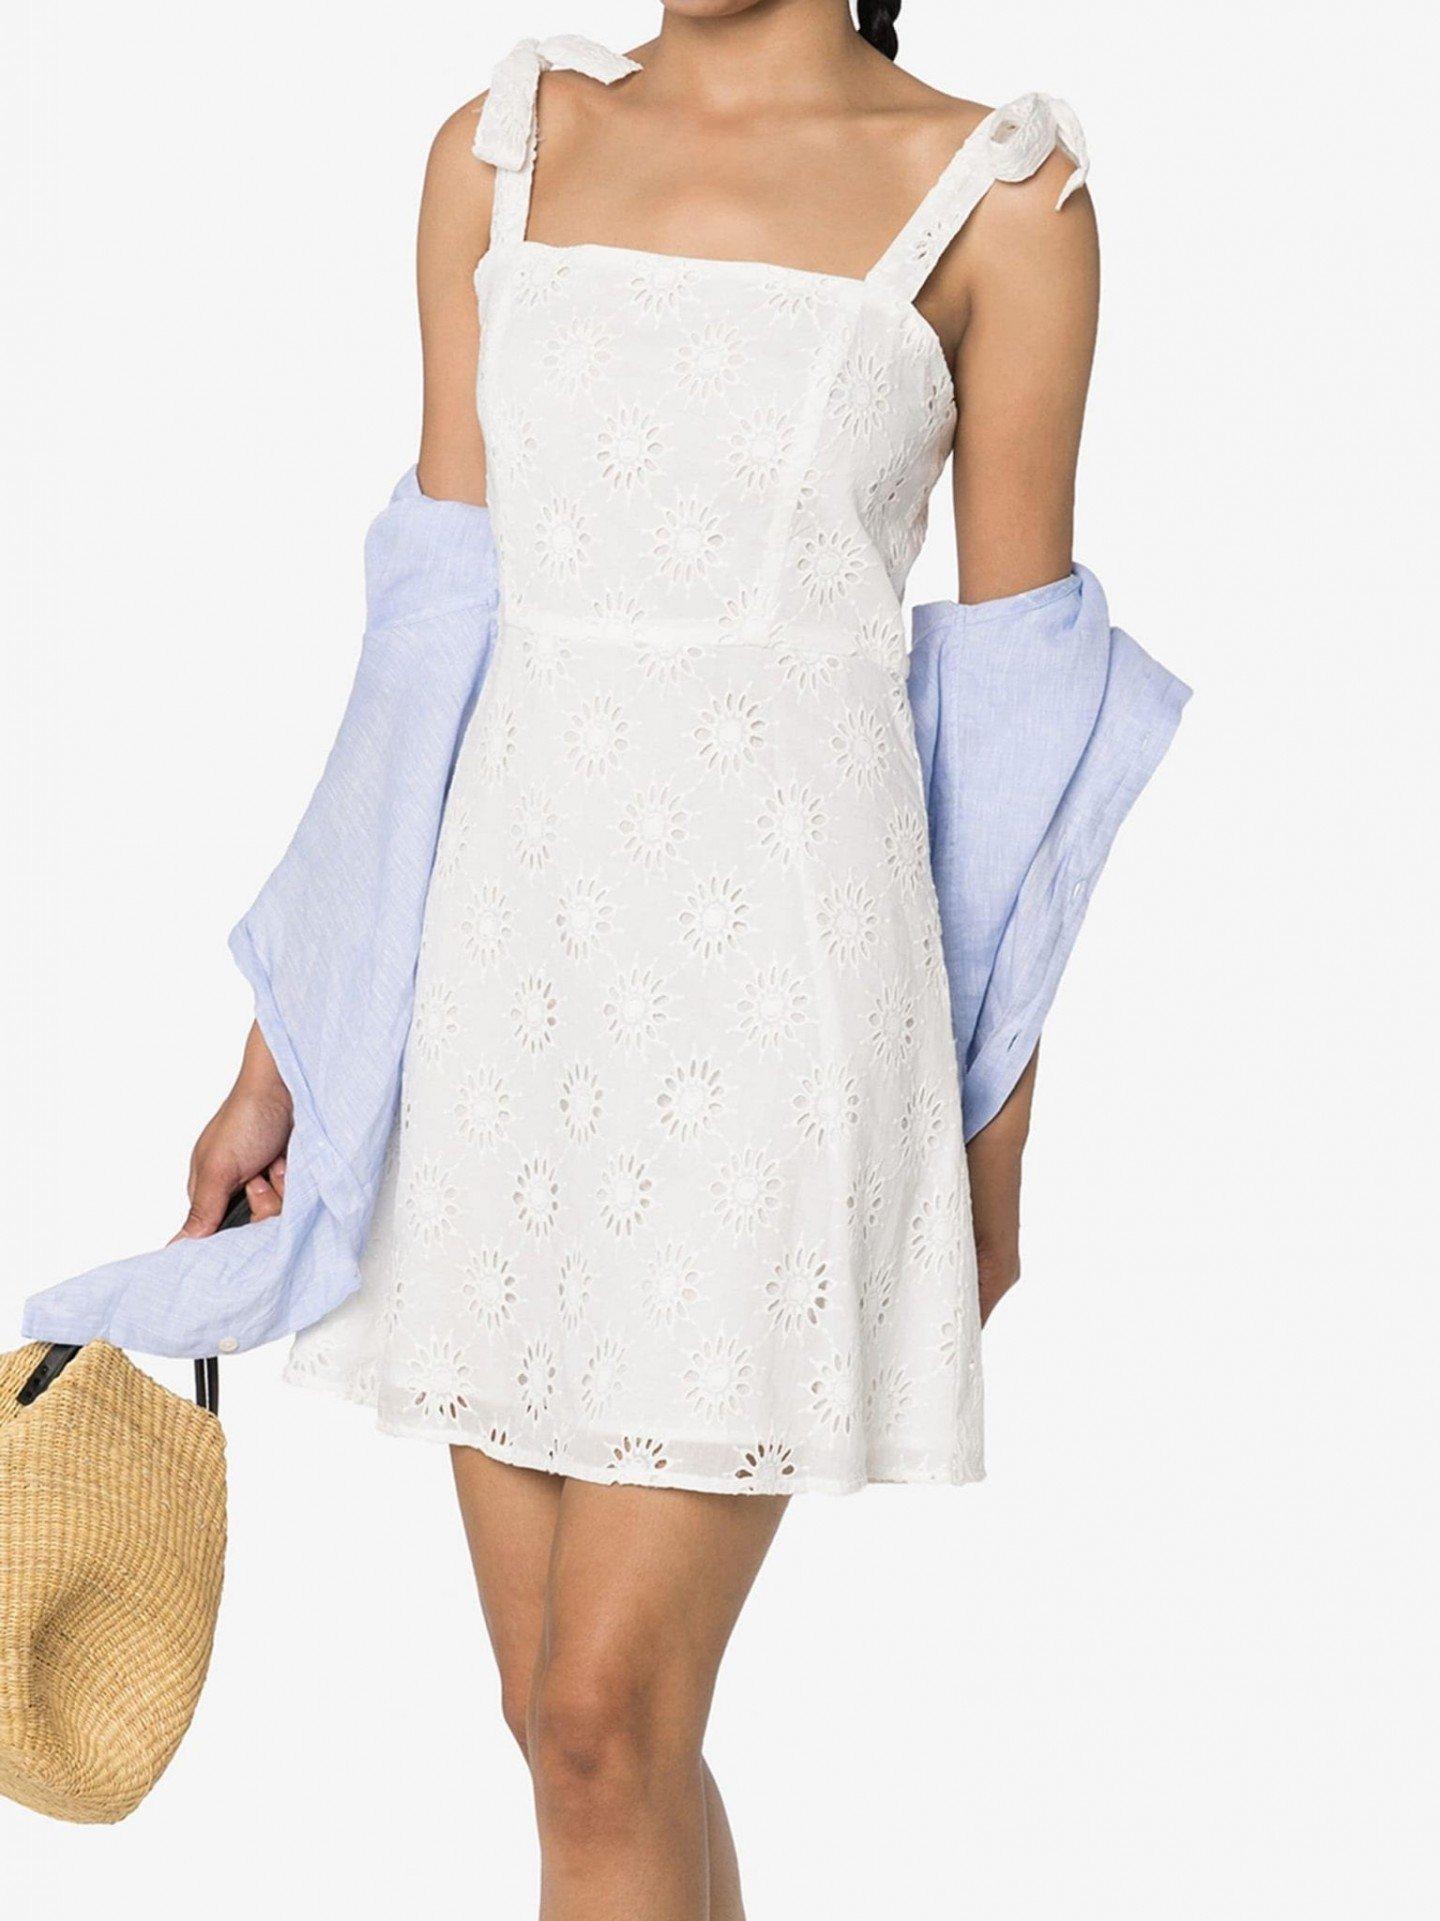 HONORINE Poppy Broderie Anglaise Mini Dress